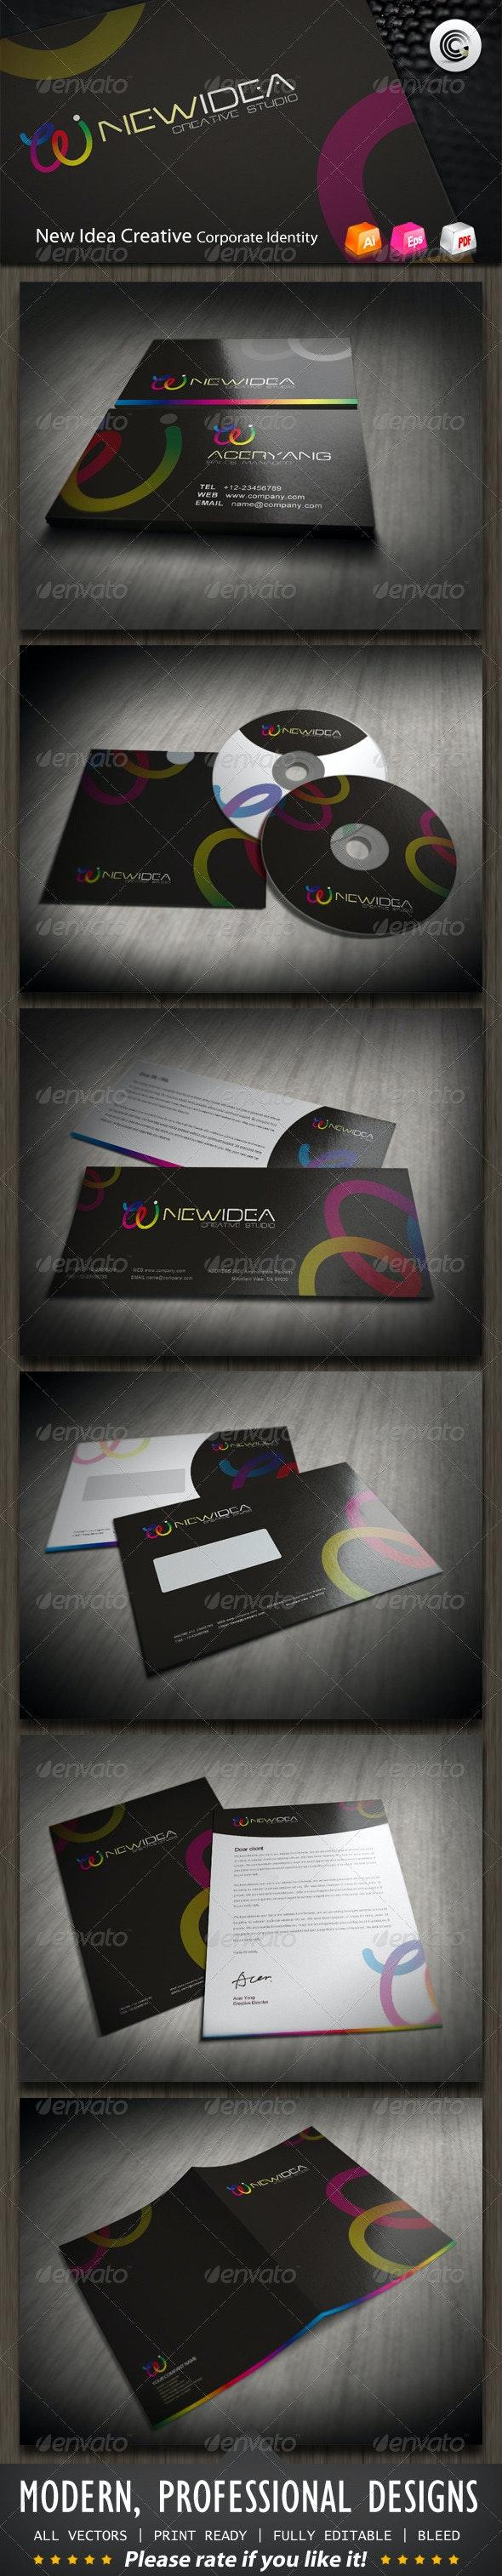 New Idea Creative Studio Corporate Identity - Stationery Print Templates